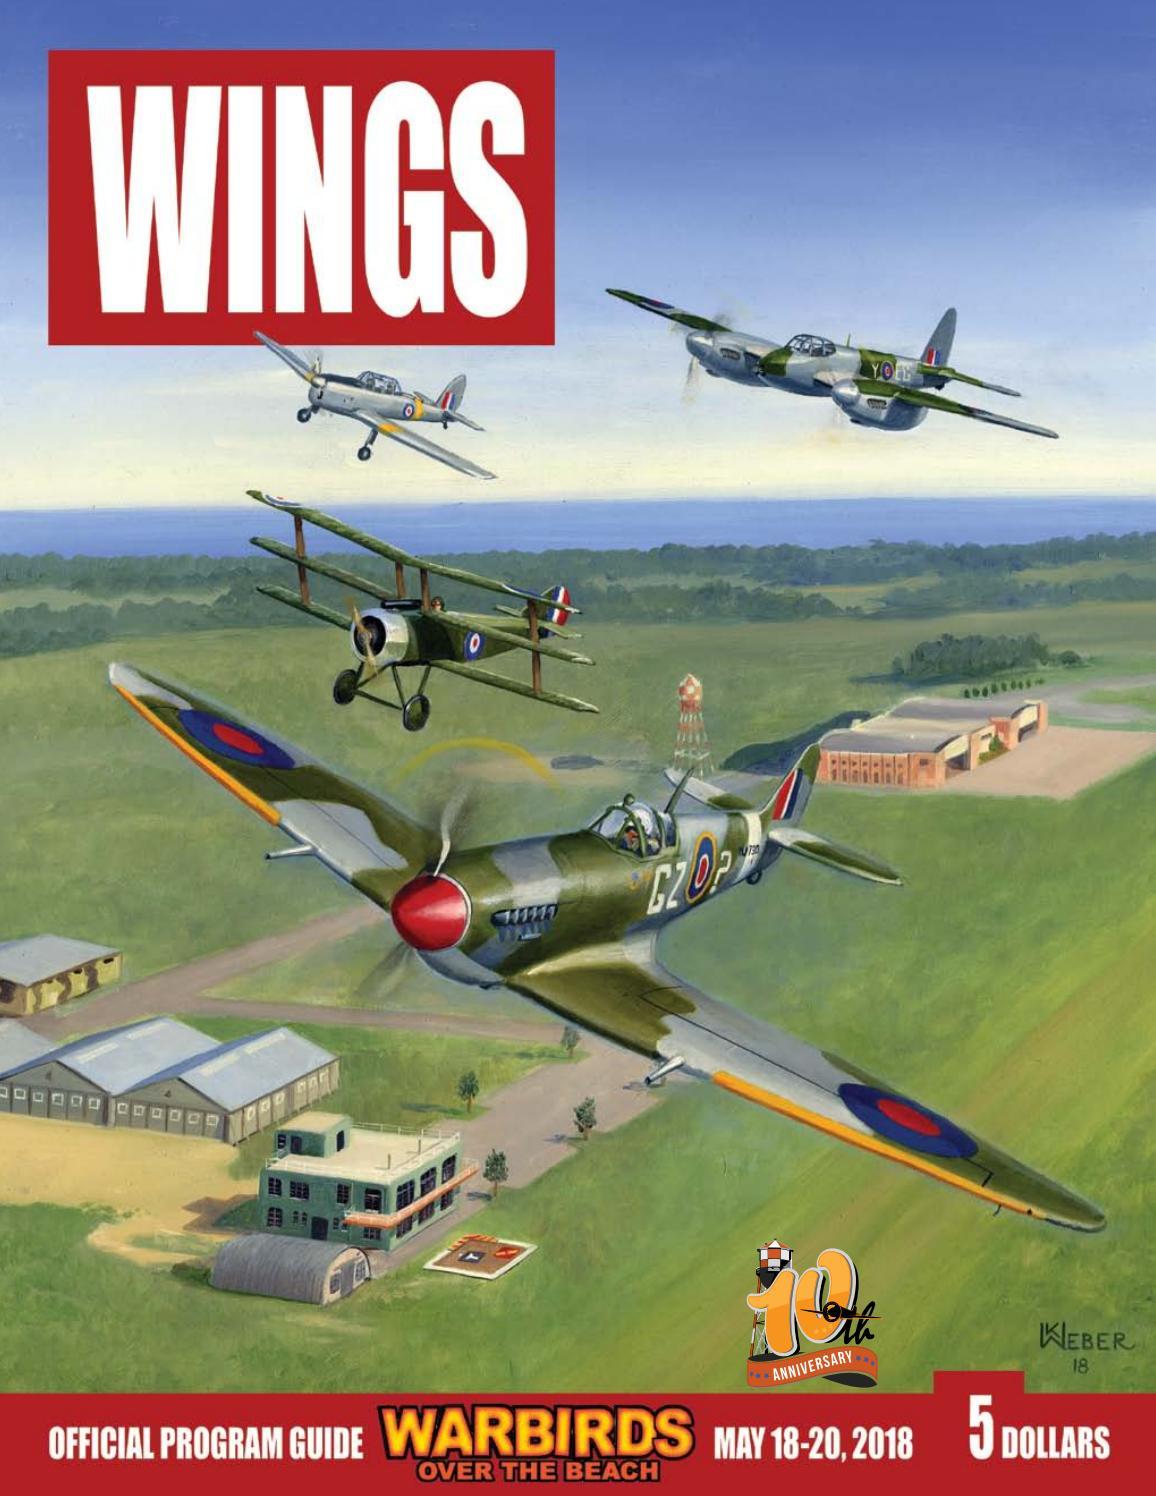 World War 2 RAF Health and Safety Spitfire Hurricane Poster A3 Reprint